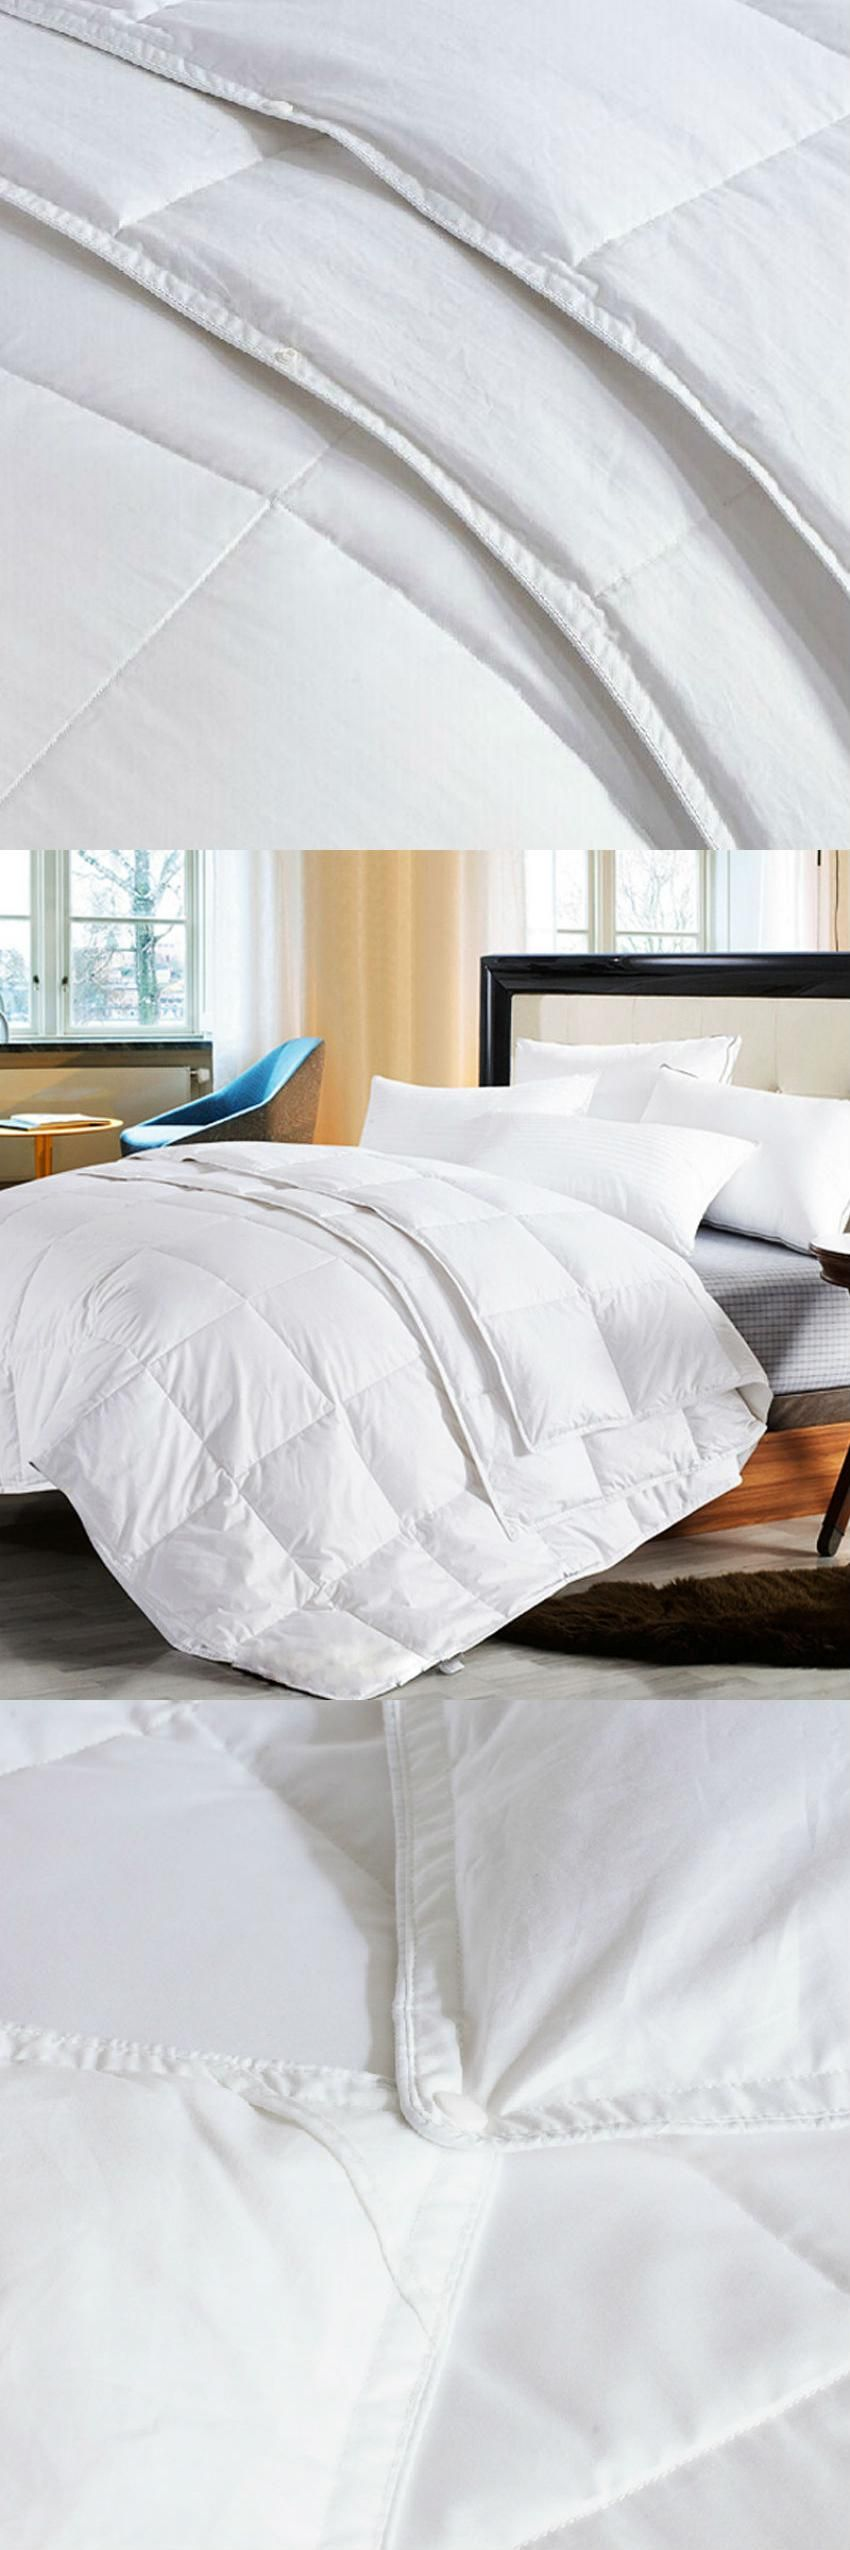 ip and gardens bedding better blanket com homes set boho comforter walmart patchwork kids